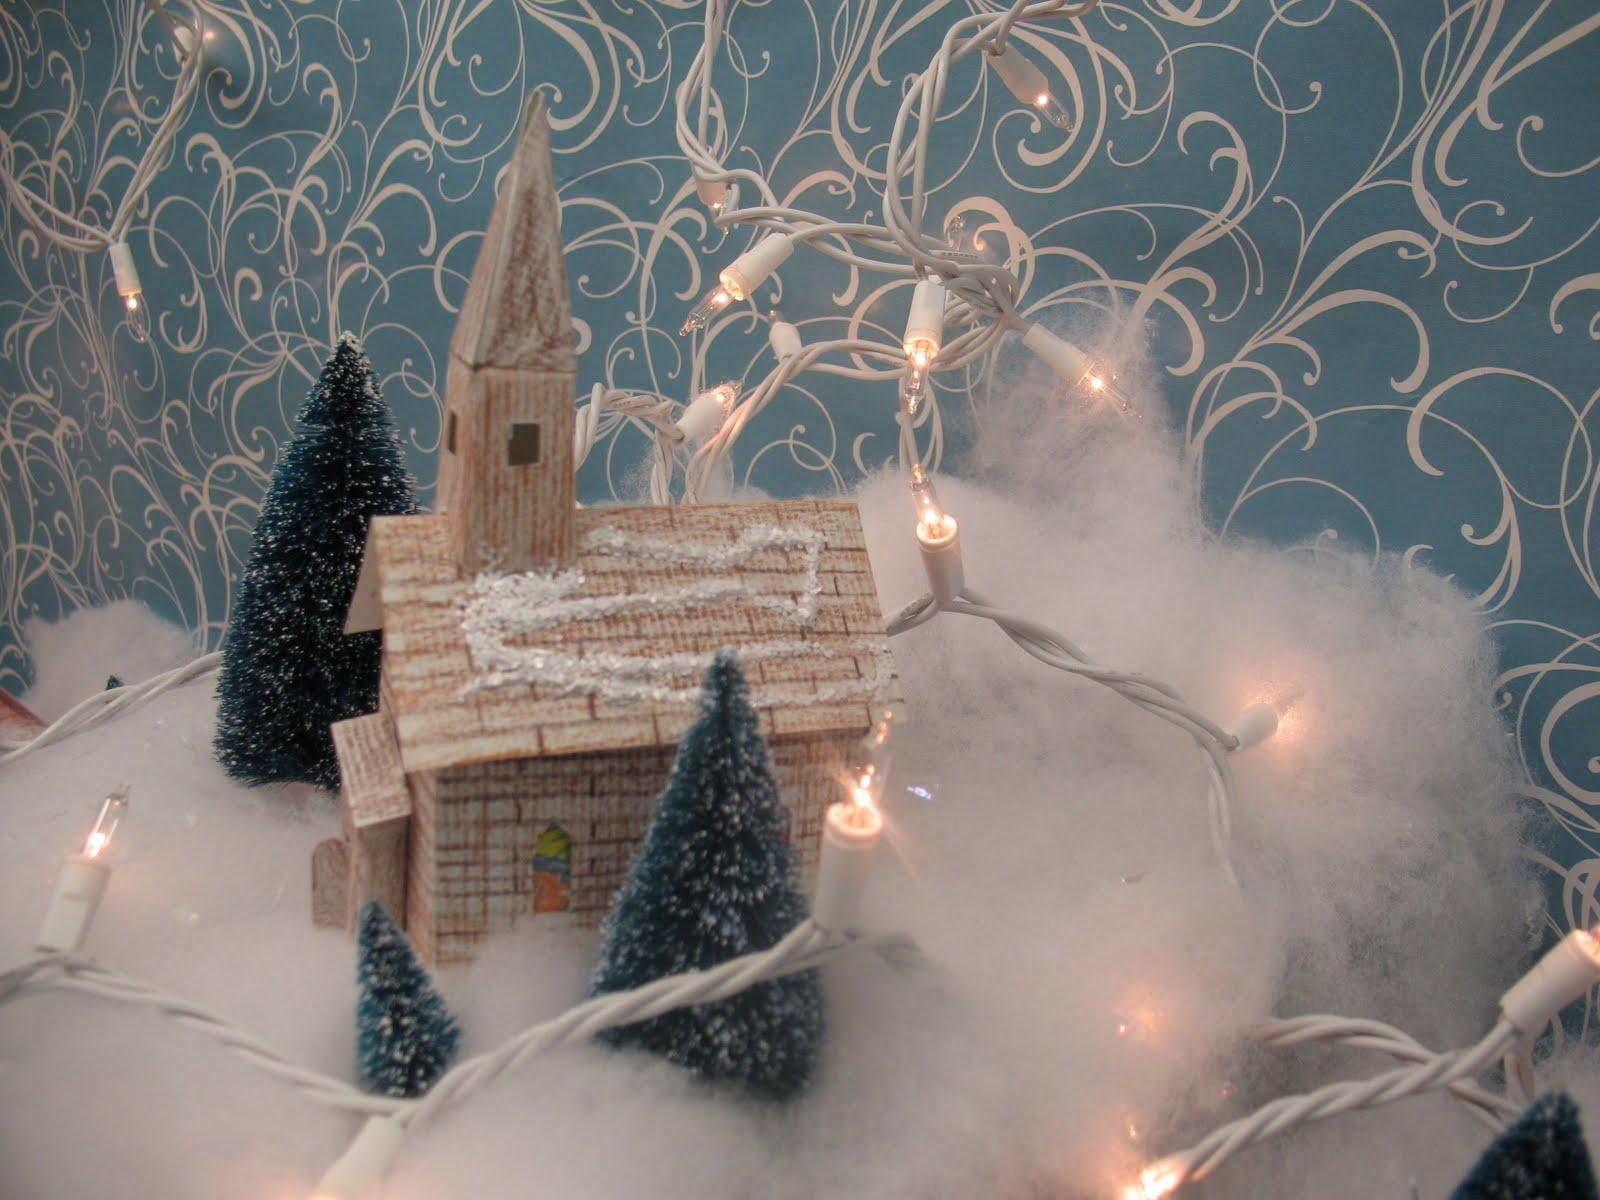 http://3.bp.blogspot.com/_RgjosfY1ka4/TPL8q4IPprI/AAAAAAAAAgY/8-vZtRfjpNA/s1600/Christmas%252525252Bvillage%252525252B006.JPG